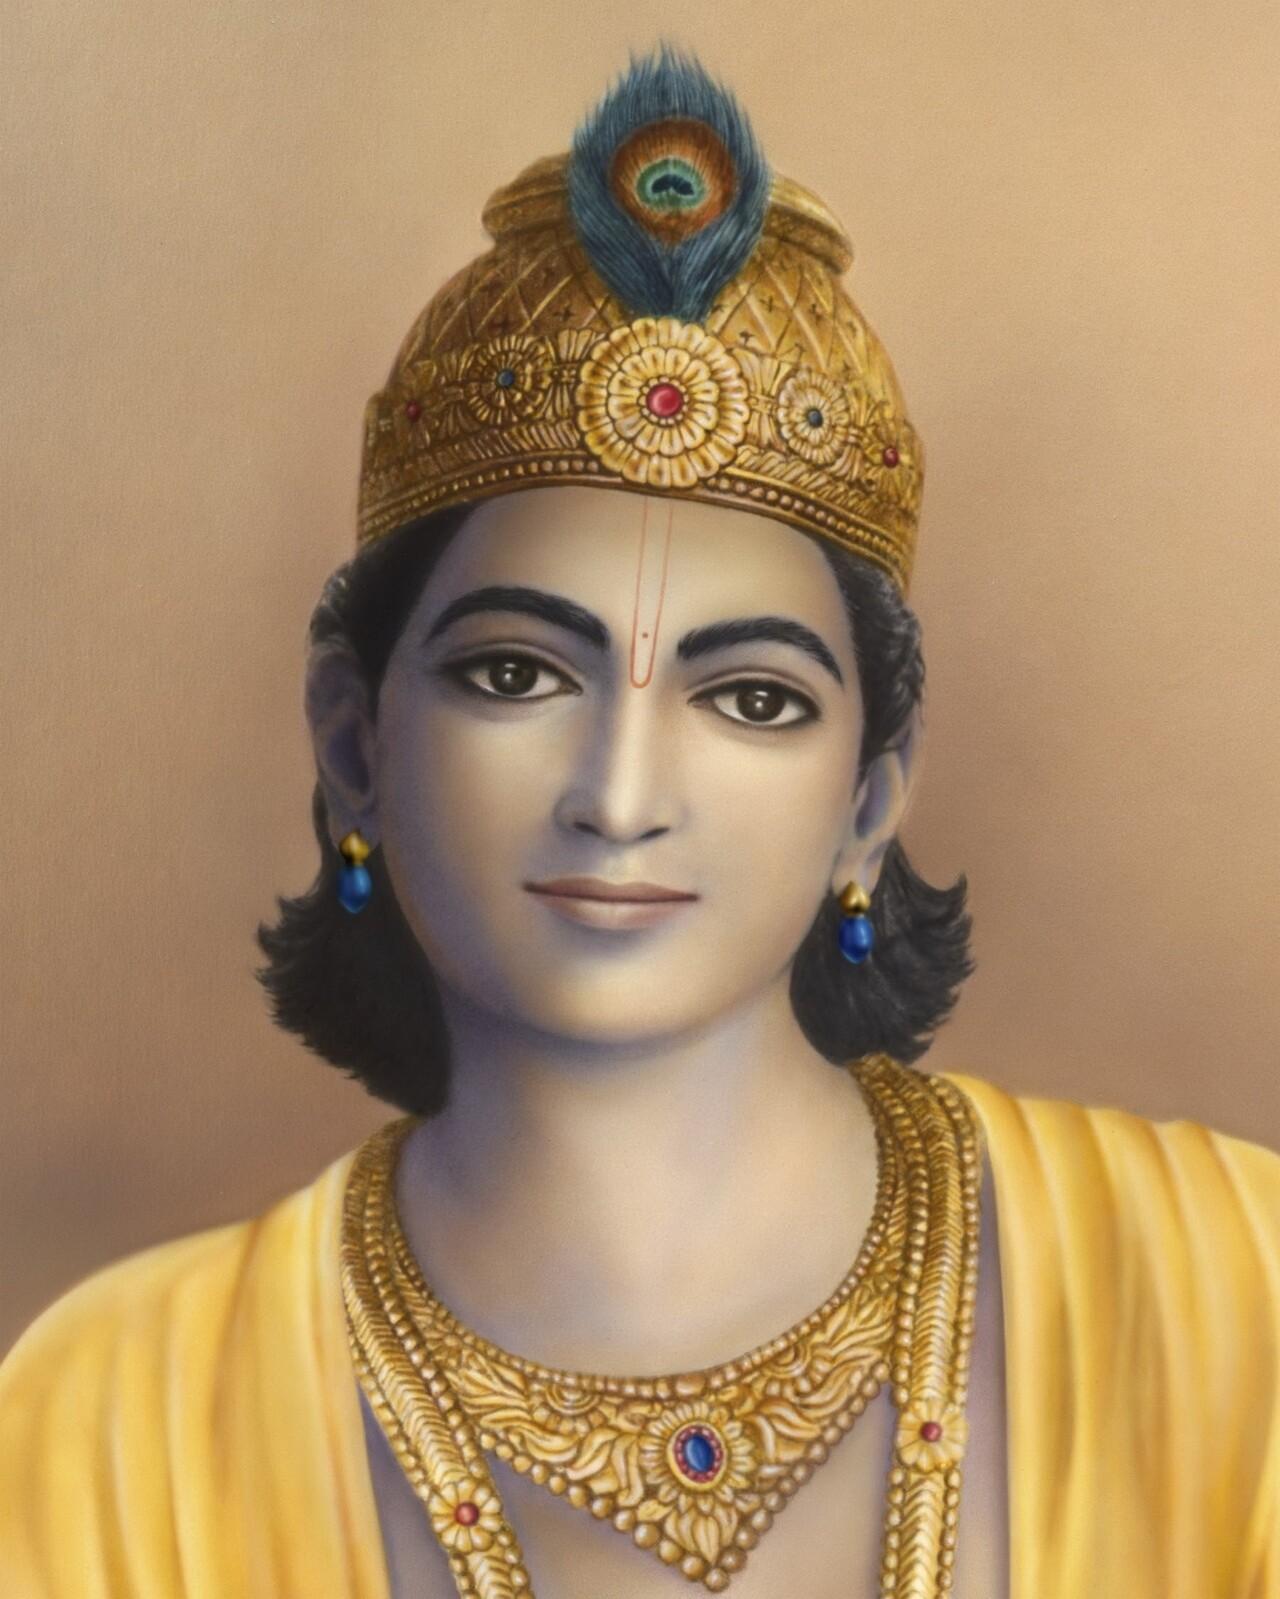 Bhagavan Krishna Altar Image 1280 Px Wide